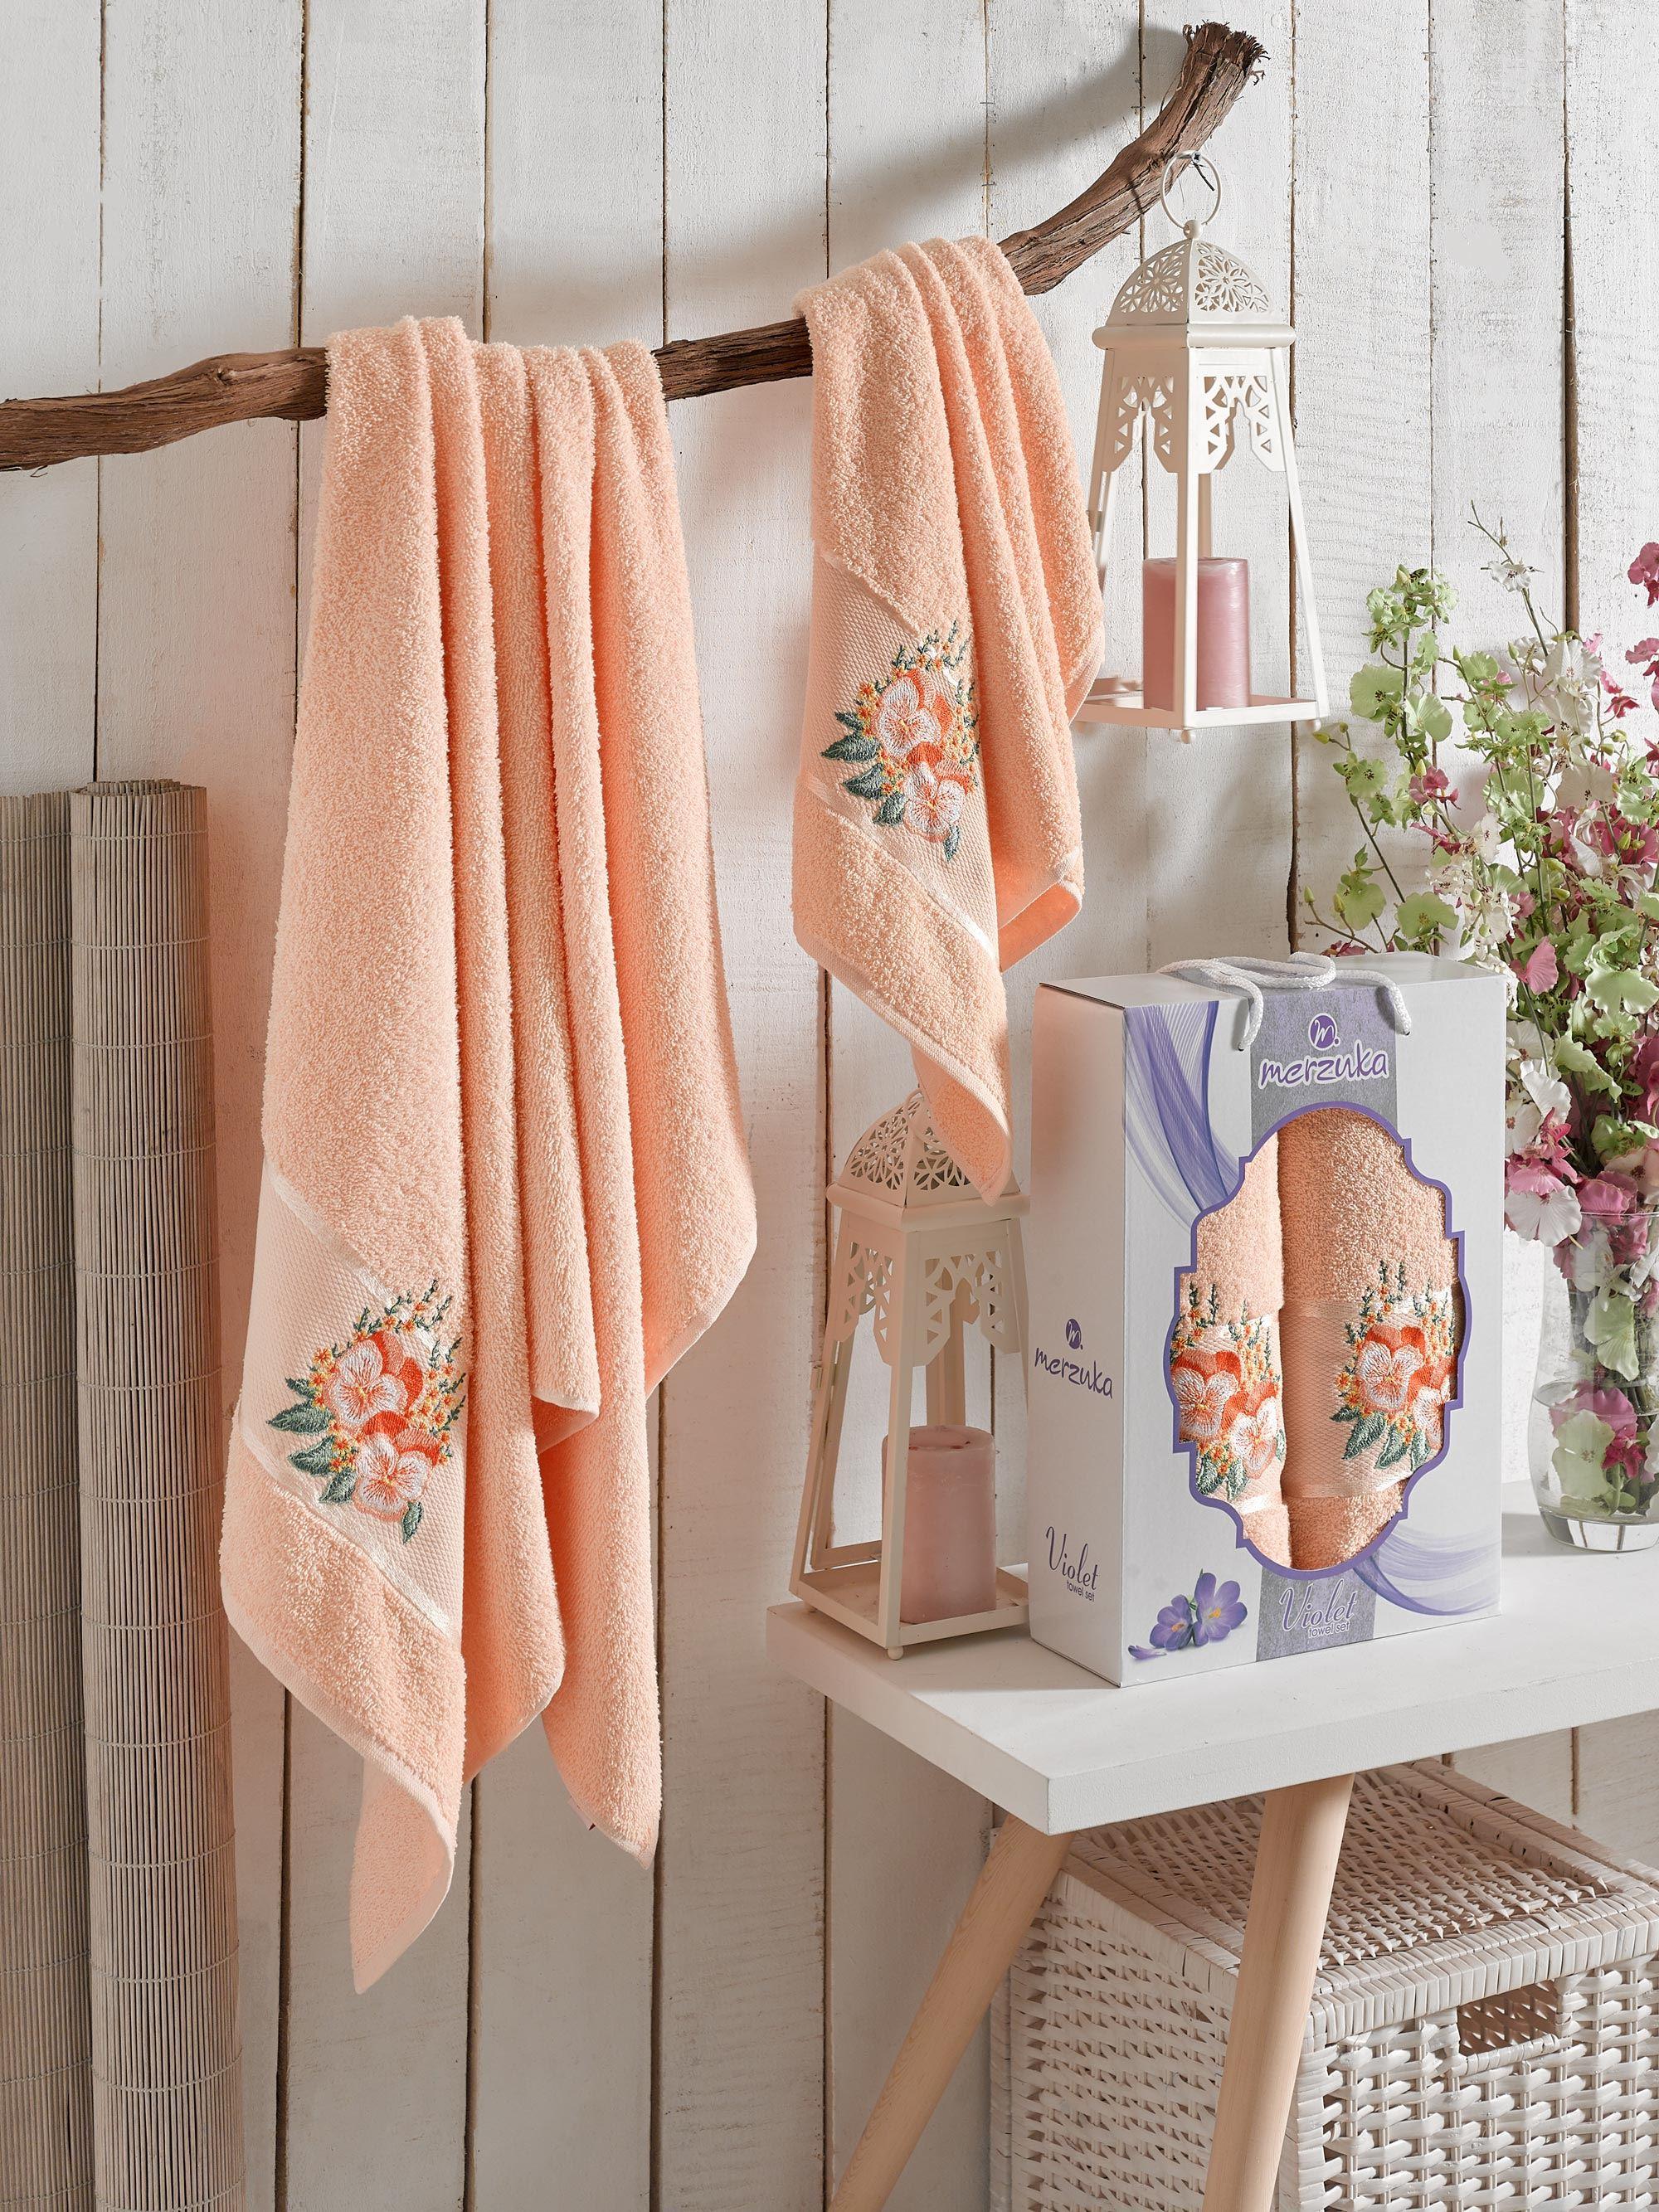 Полотенца Oran Merzuka Полотенце Violet Цвет: Оранжевый (50х80 см,70х130 см) полотенца oran merzuka полотенце daisy цвет сиреневый 50х80 см 2 шт 70х130 см